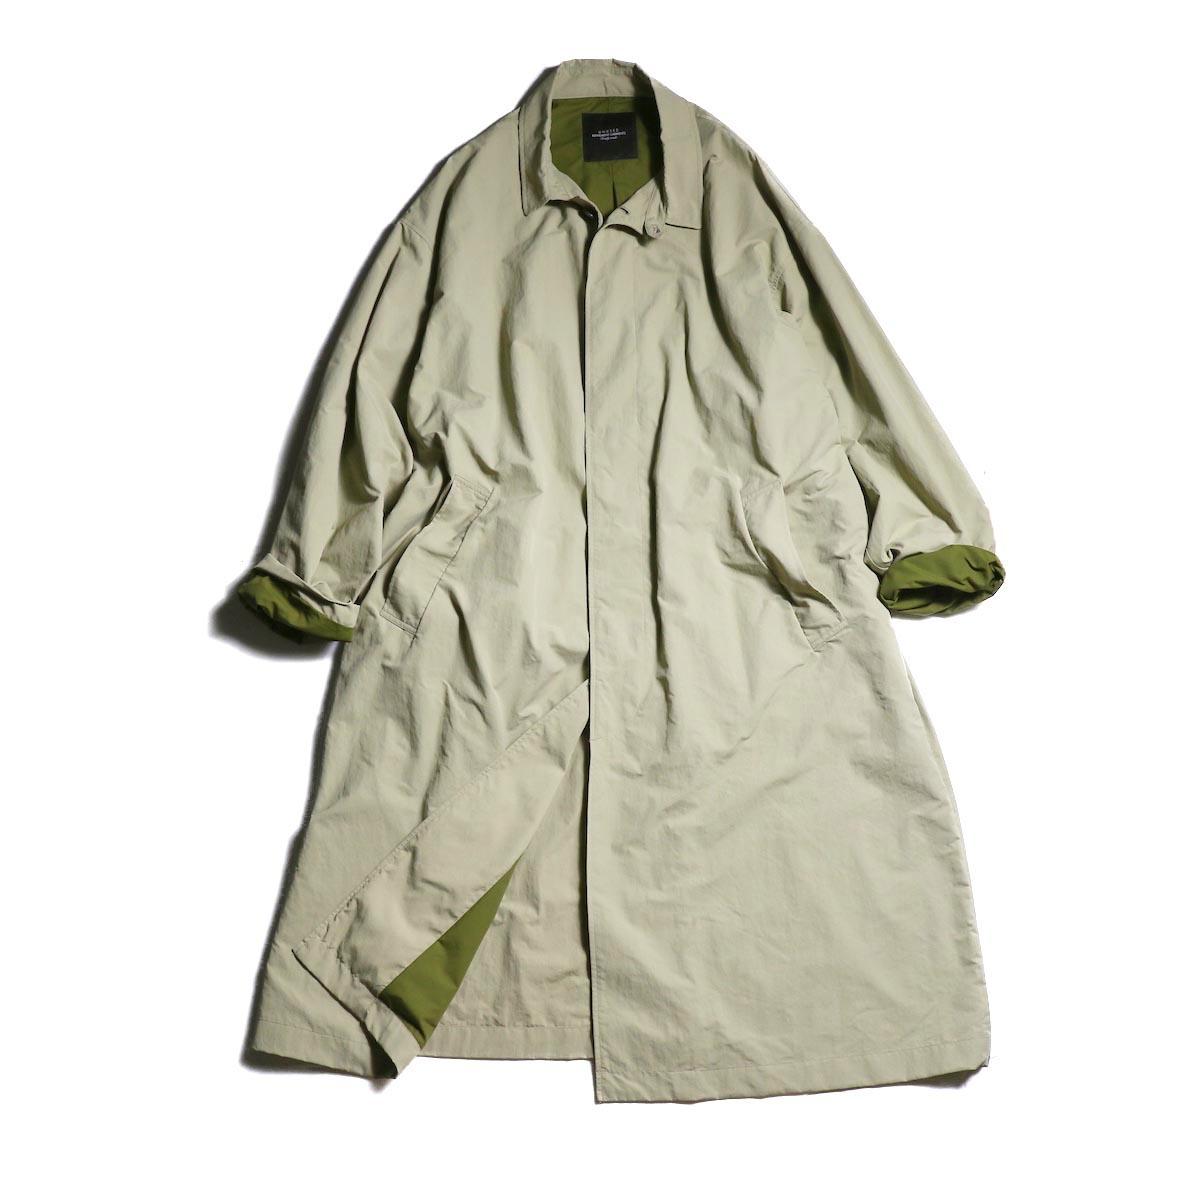 UNUSED / US1670 Nylon Coat. (Beige)